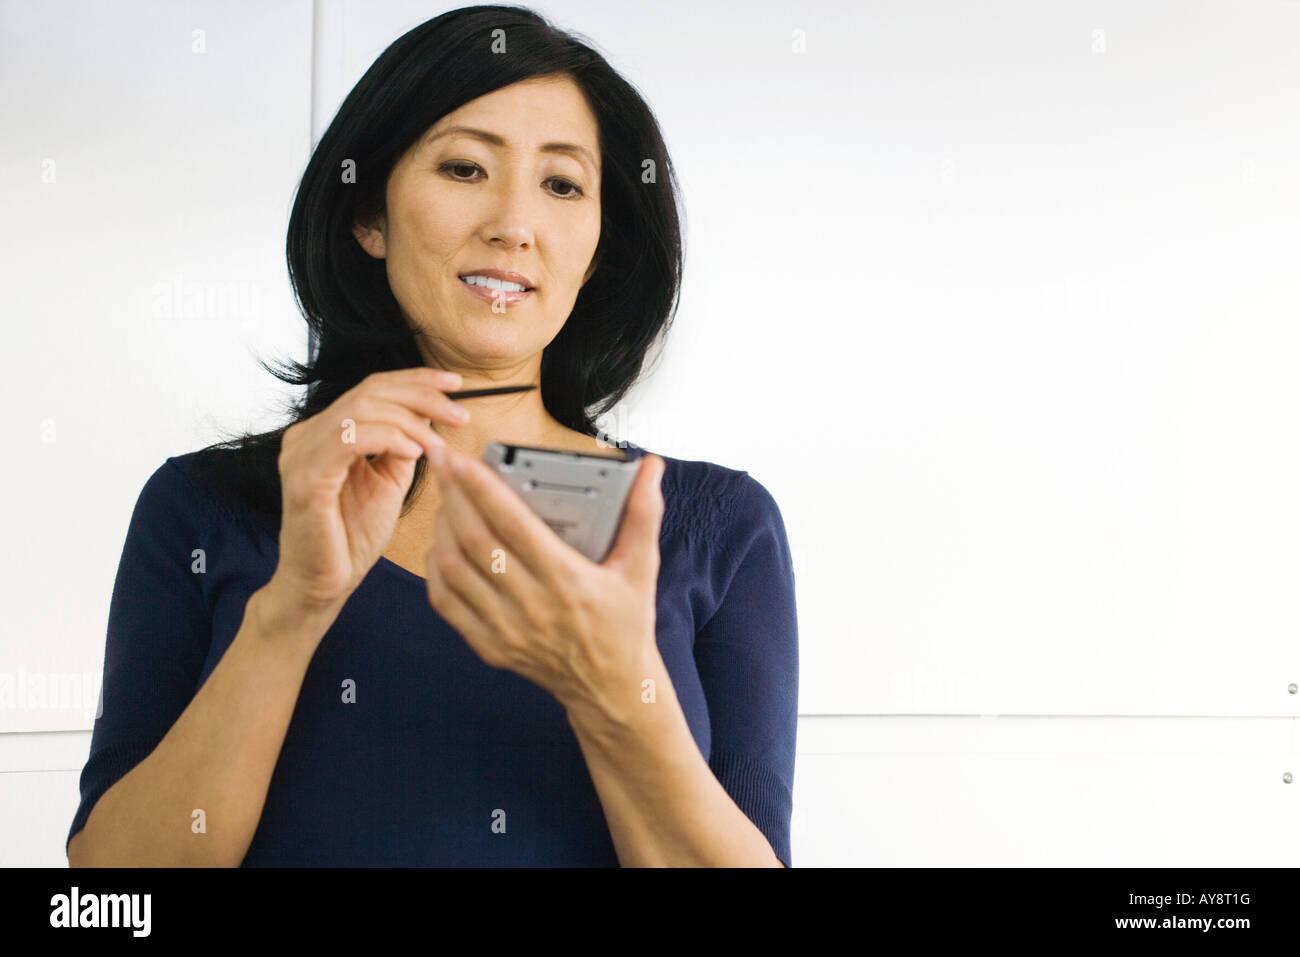 Woman using palmtop, looking down, smiling - Stock Image